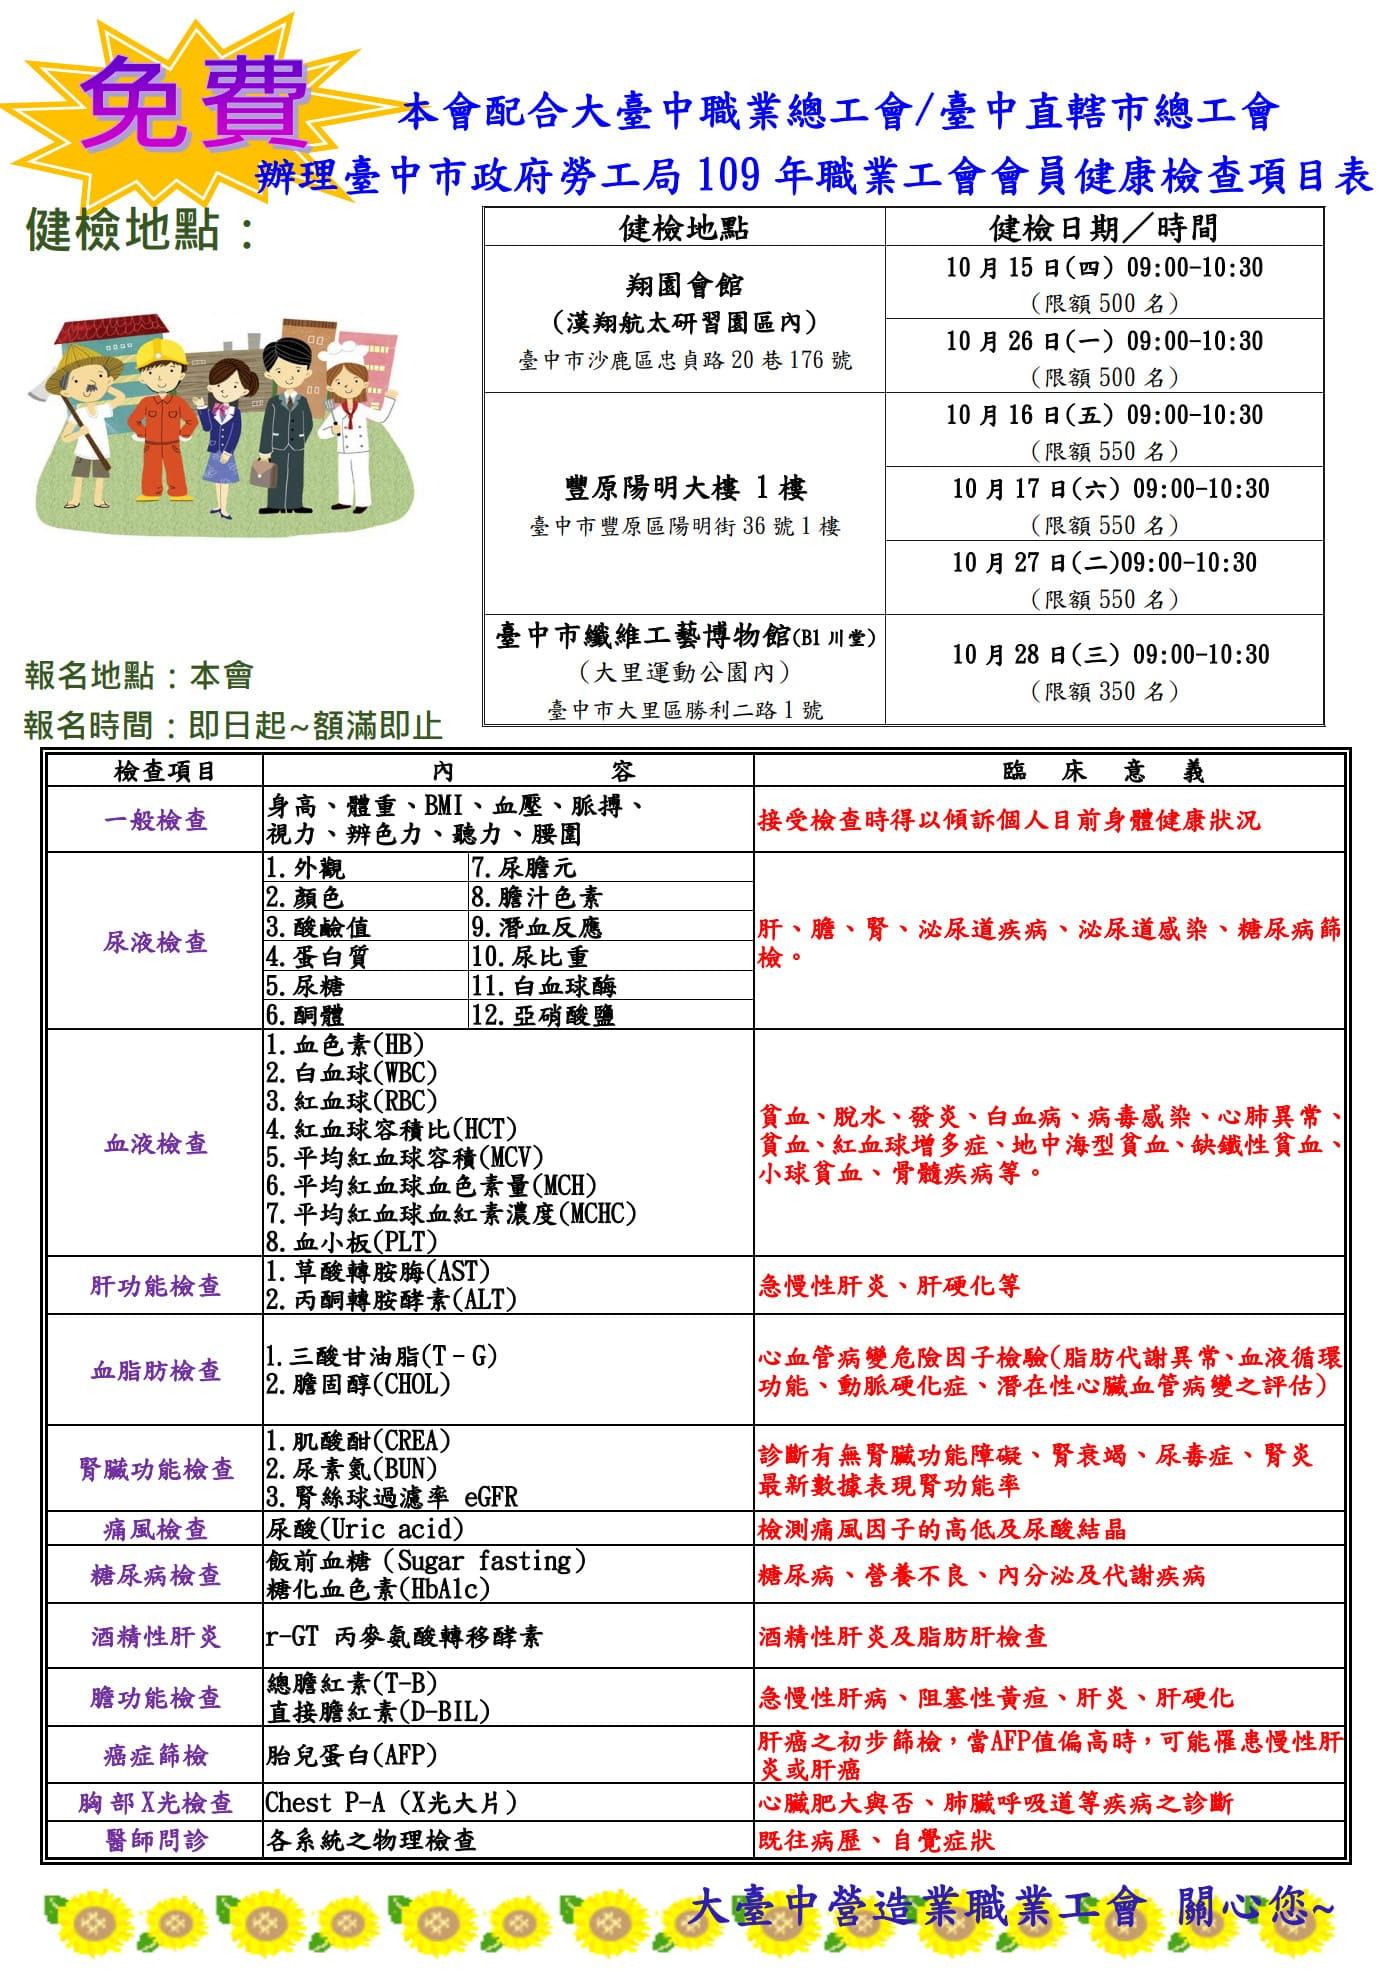 proimages/大臺中-109健康檢查.jpg